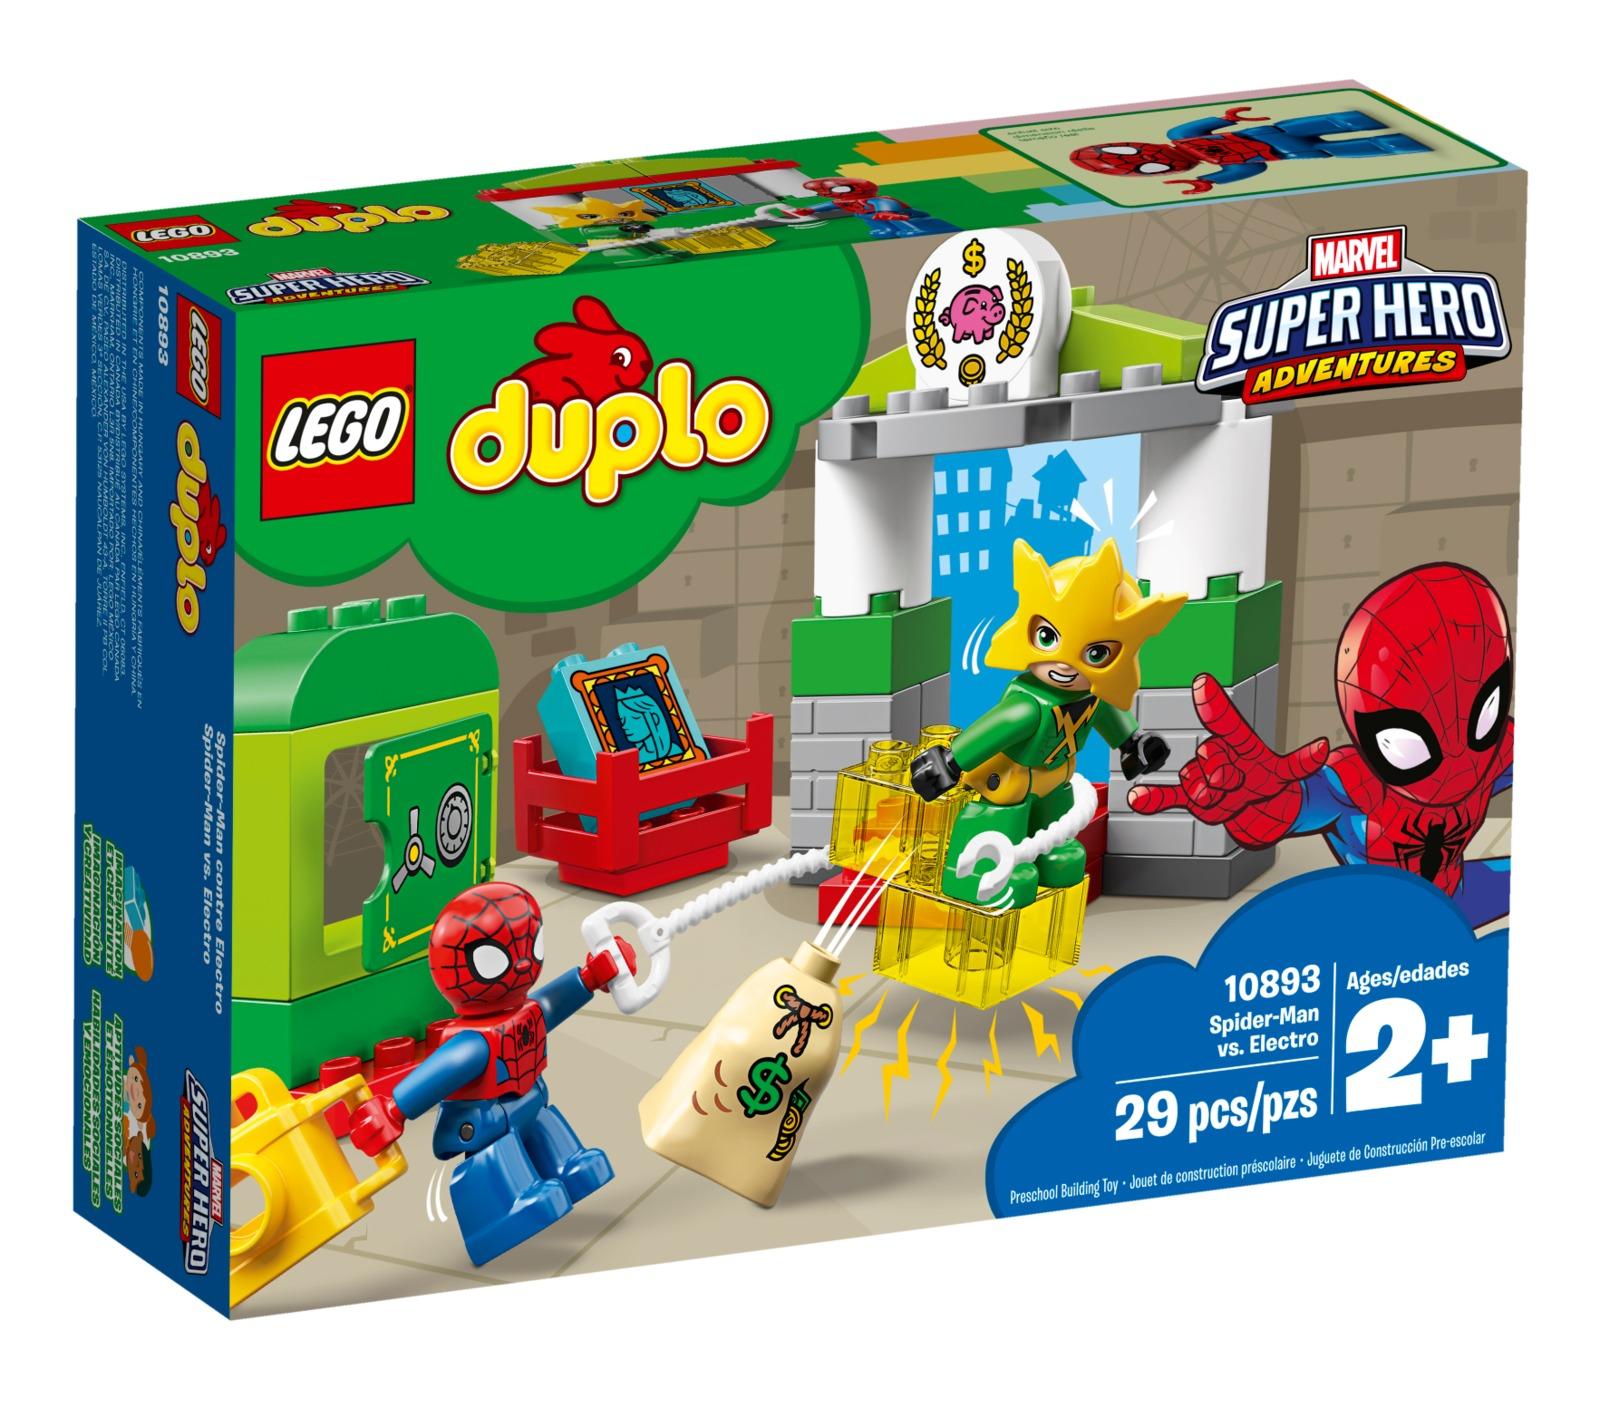 LEGO DUPLO - Spider-Man vs. Electro image